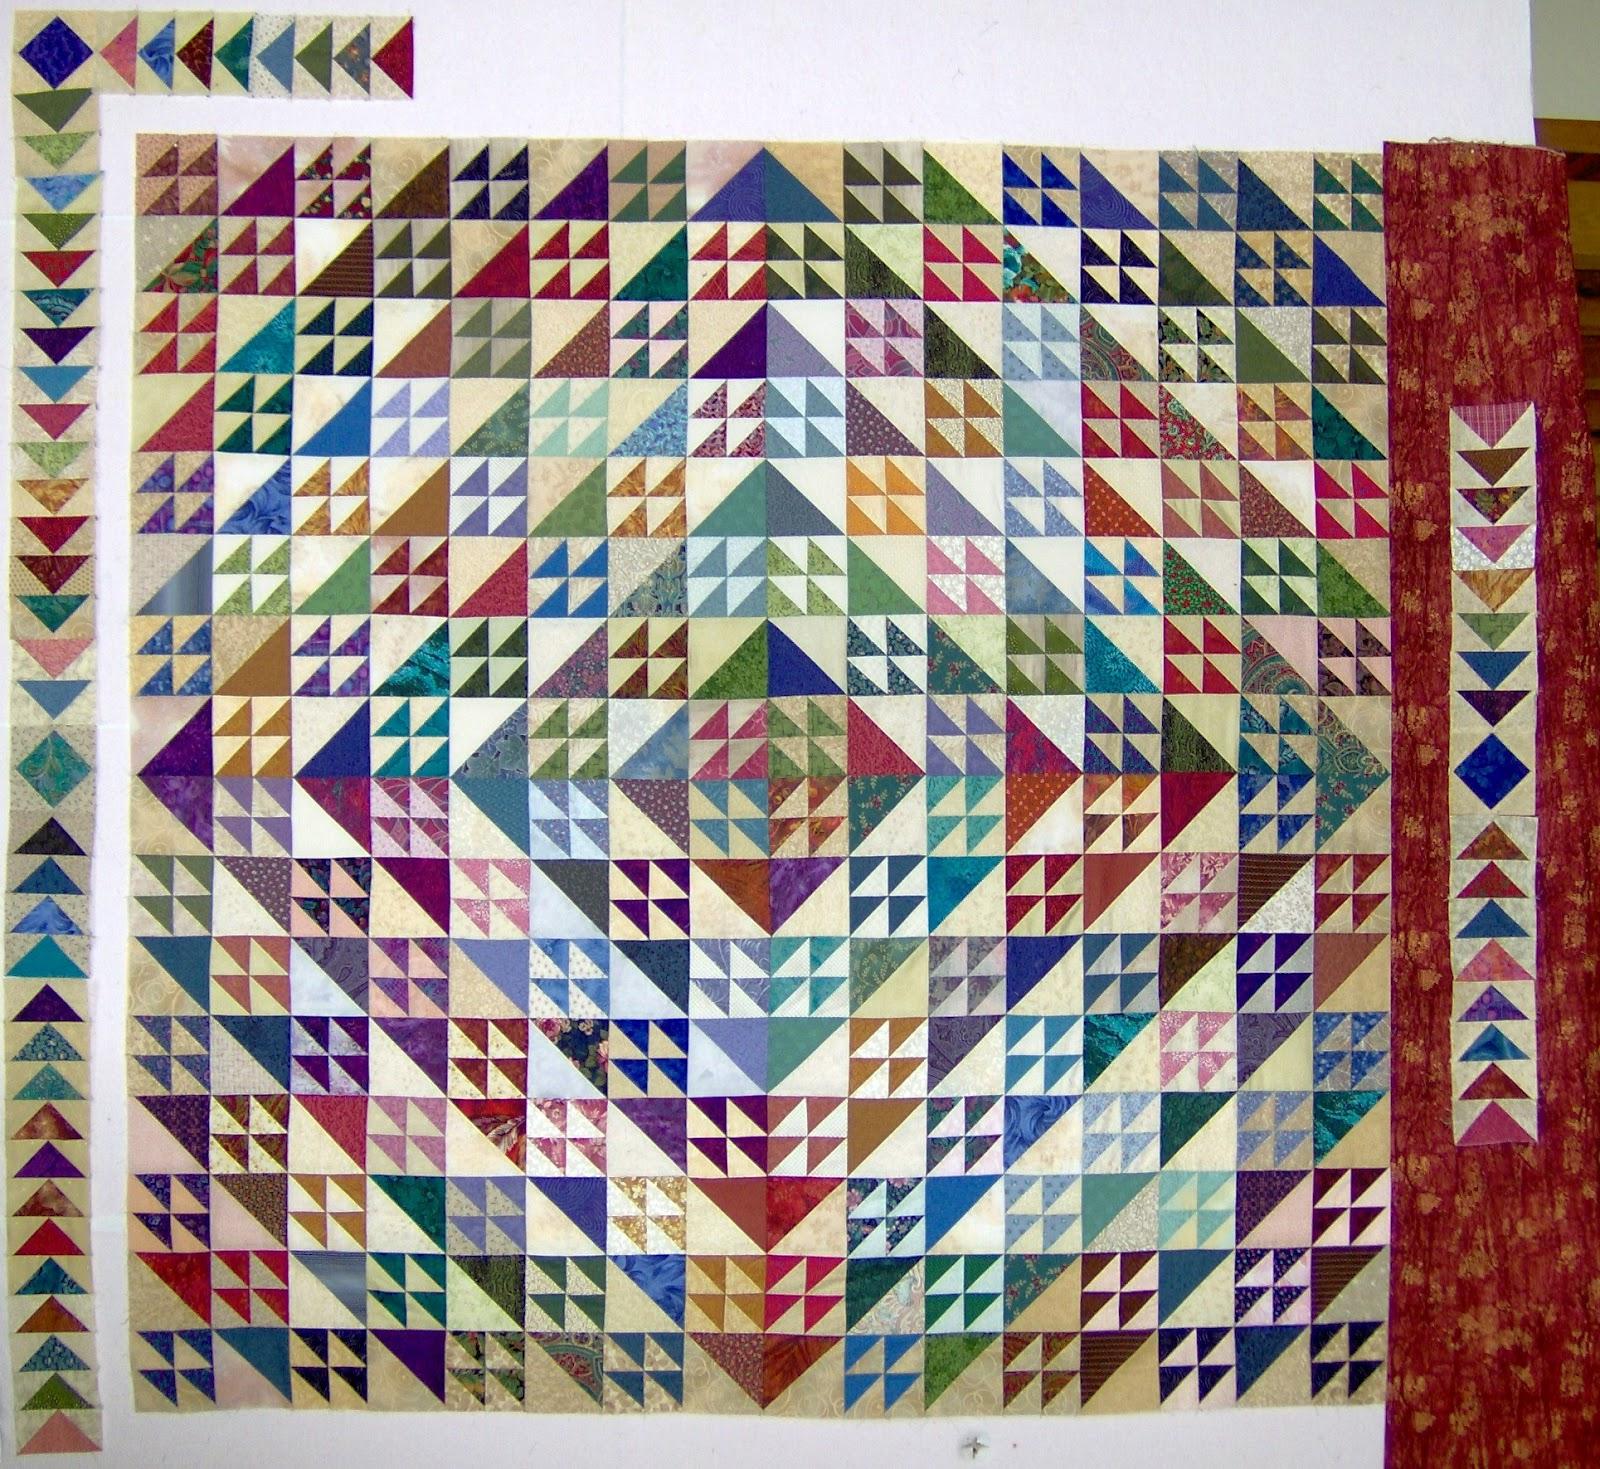 Gayle Bong Quilts Too: A closer look